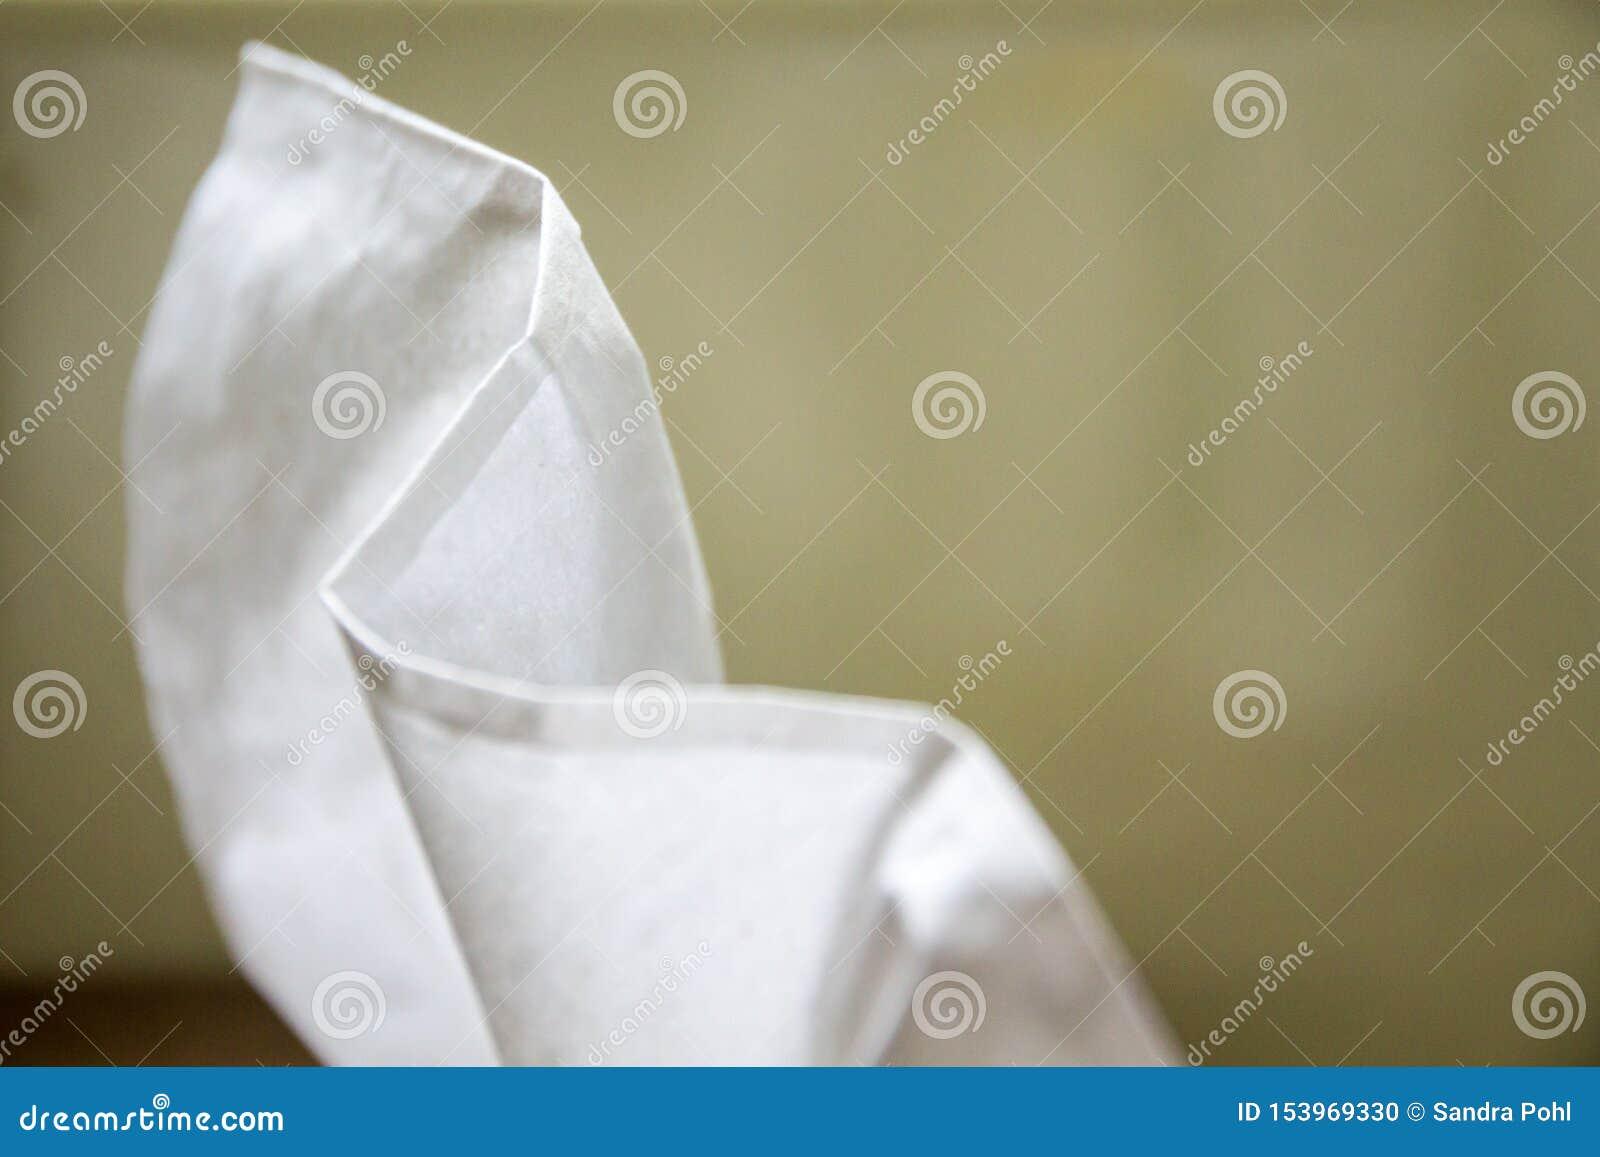 Witte towelette op groene achtergrond